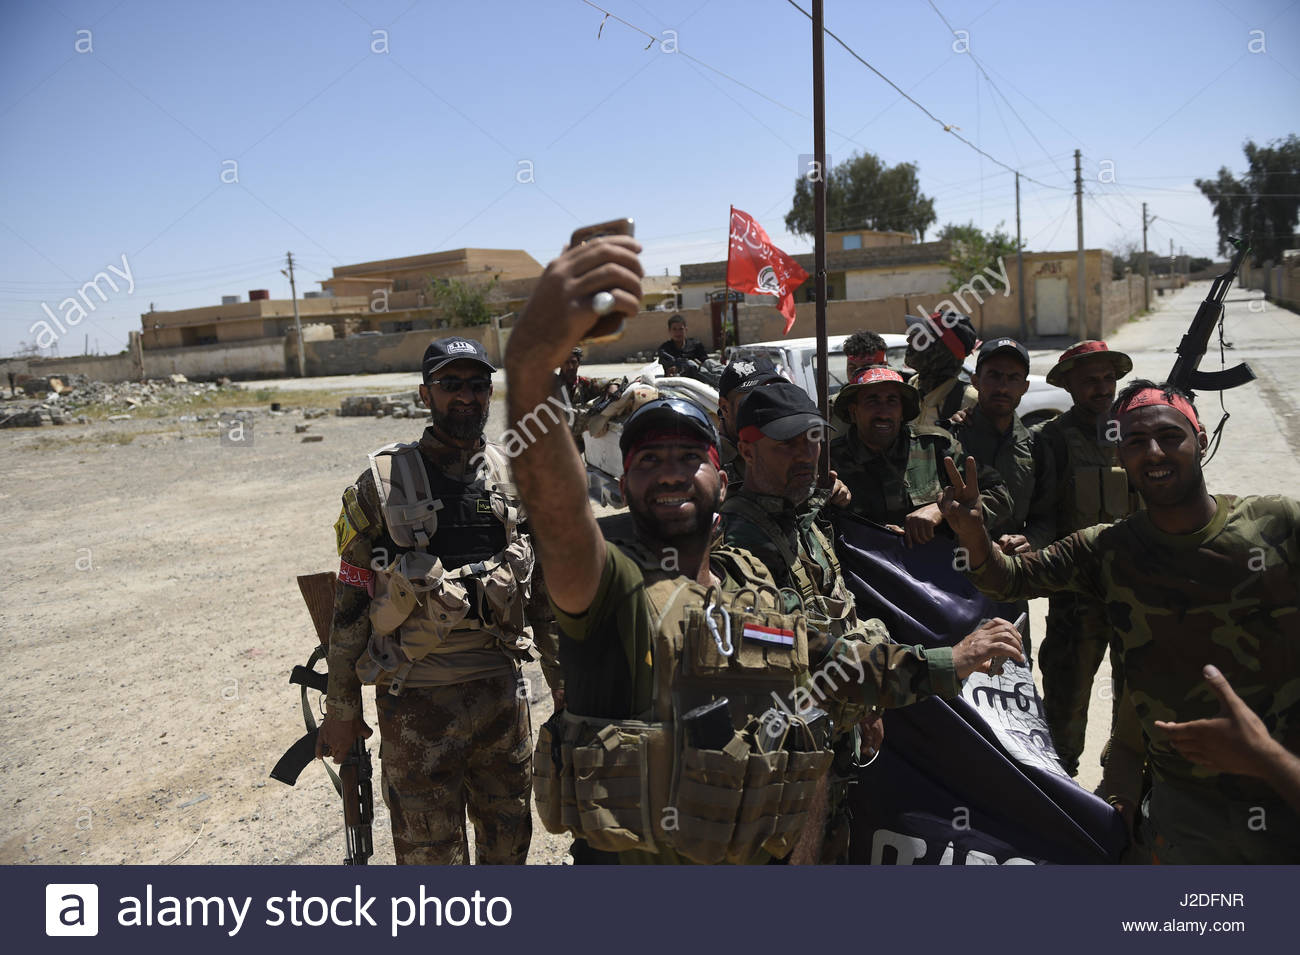 Hatra, Iraq. 27th Apr, 2017. Iraqi government forces from Popular Mobilization Units (PMU) take celebratory selfies - Stock Image